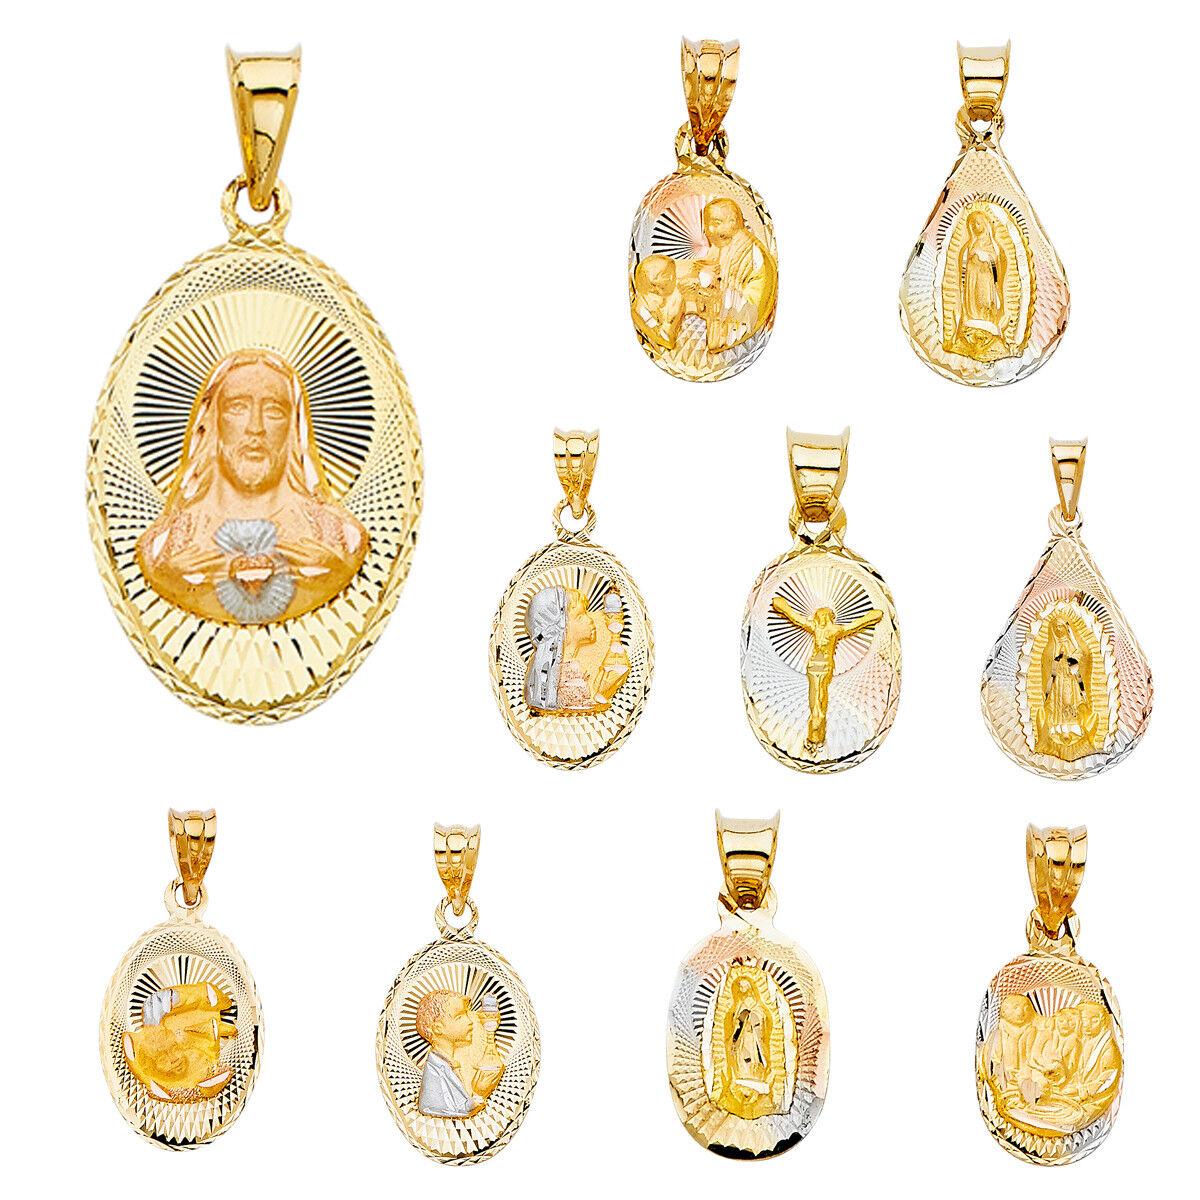 14K Tri color gold Diamond Cut Jesus Stamp Religious Pendant Collection